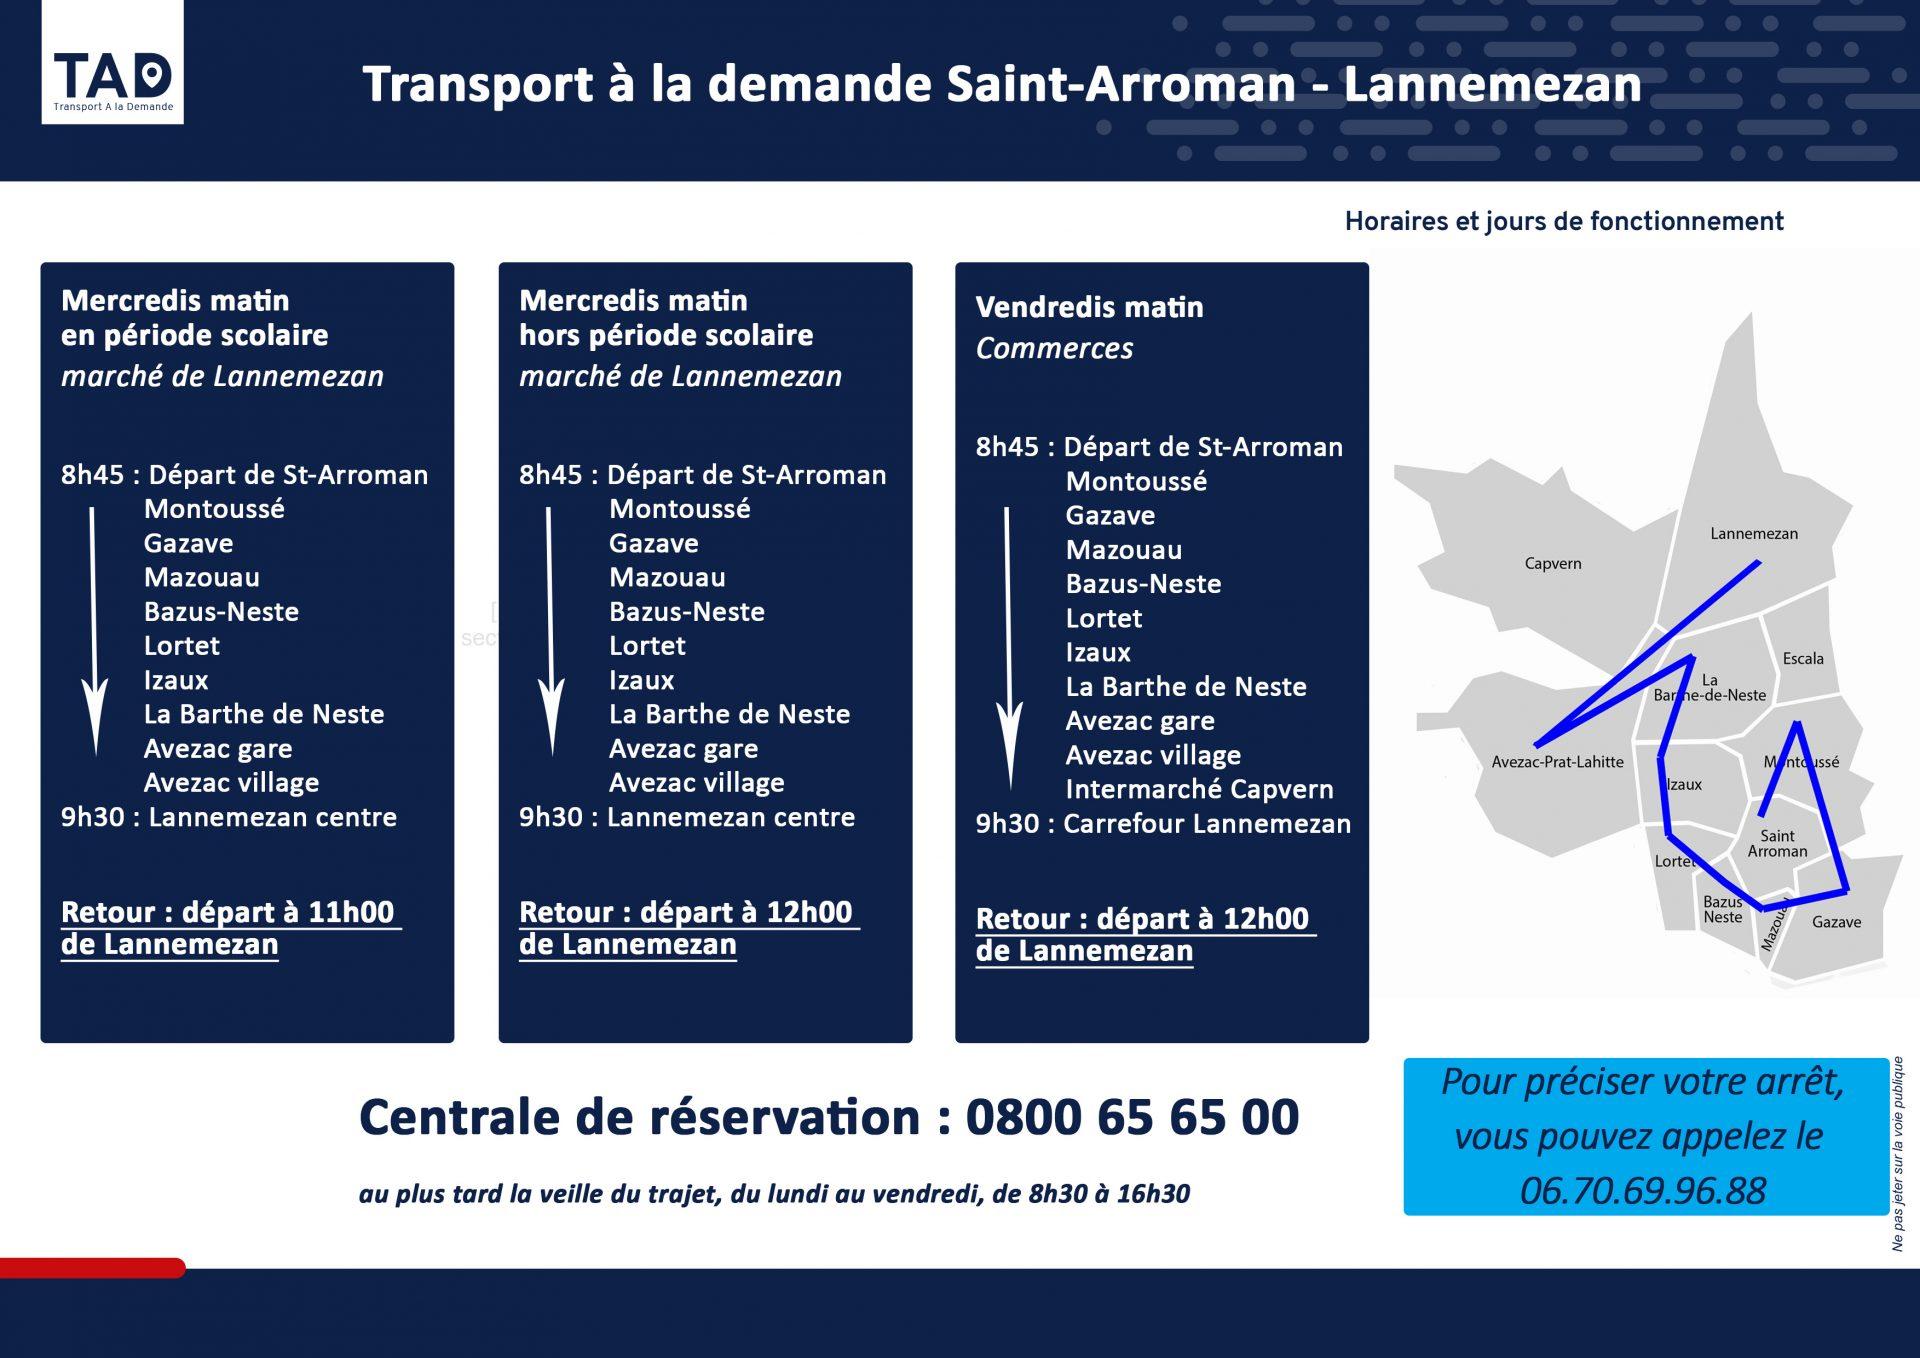 TAD Saint-Arroman